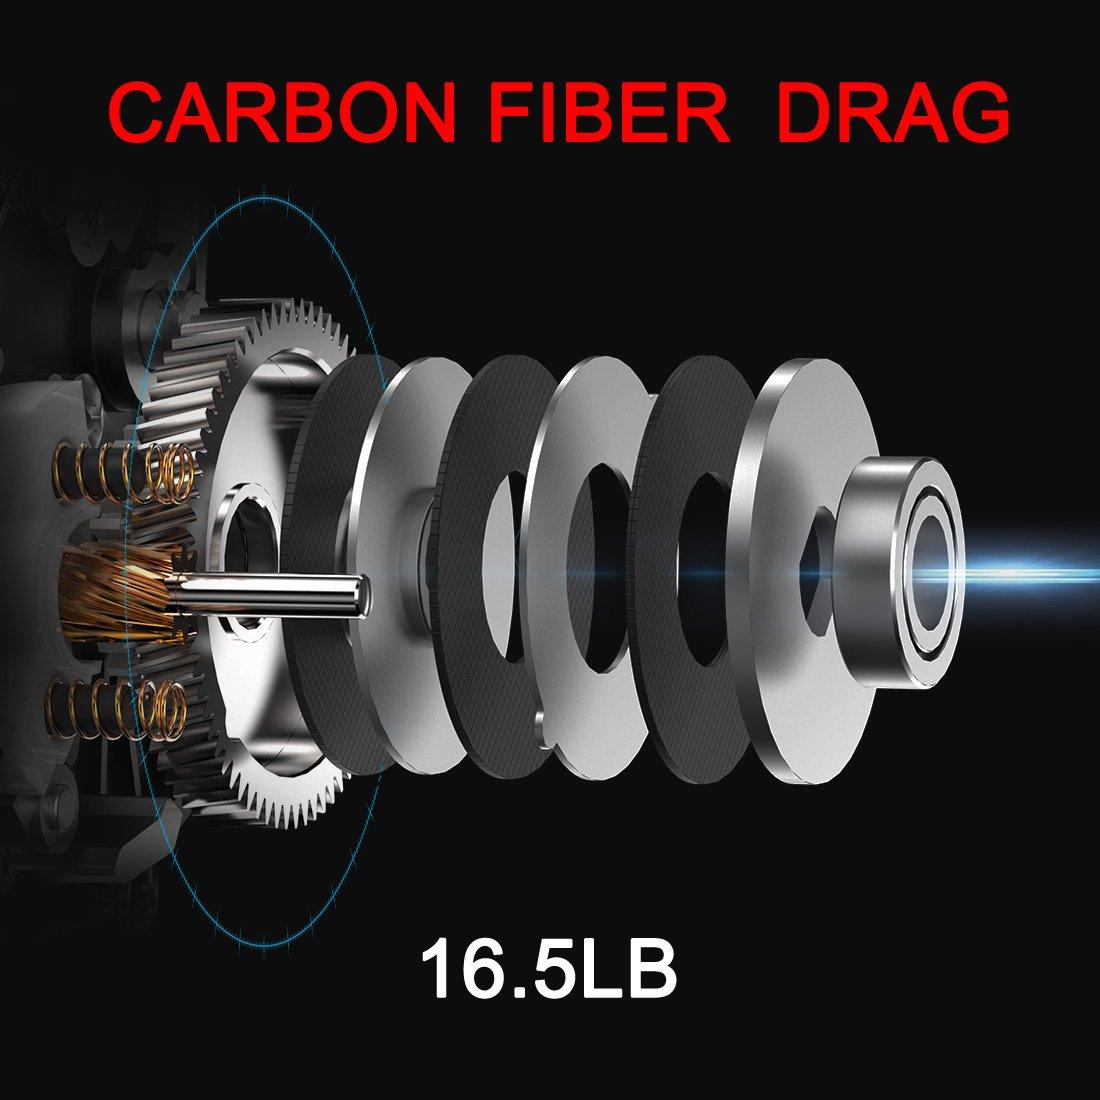 SeaKnight ELF II Baitcasting Reel. Super Light C45 Carbon Fiber Frame, Dual Magnetic and Centrifugal Brake System, 6.4 1 7.2 1 Retrieve Tournament Grade Casting Reel